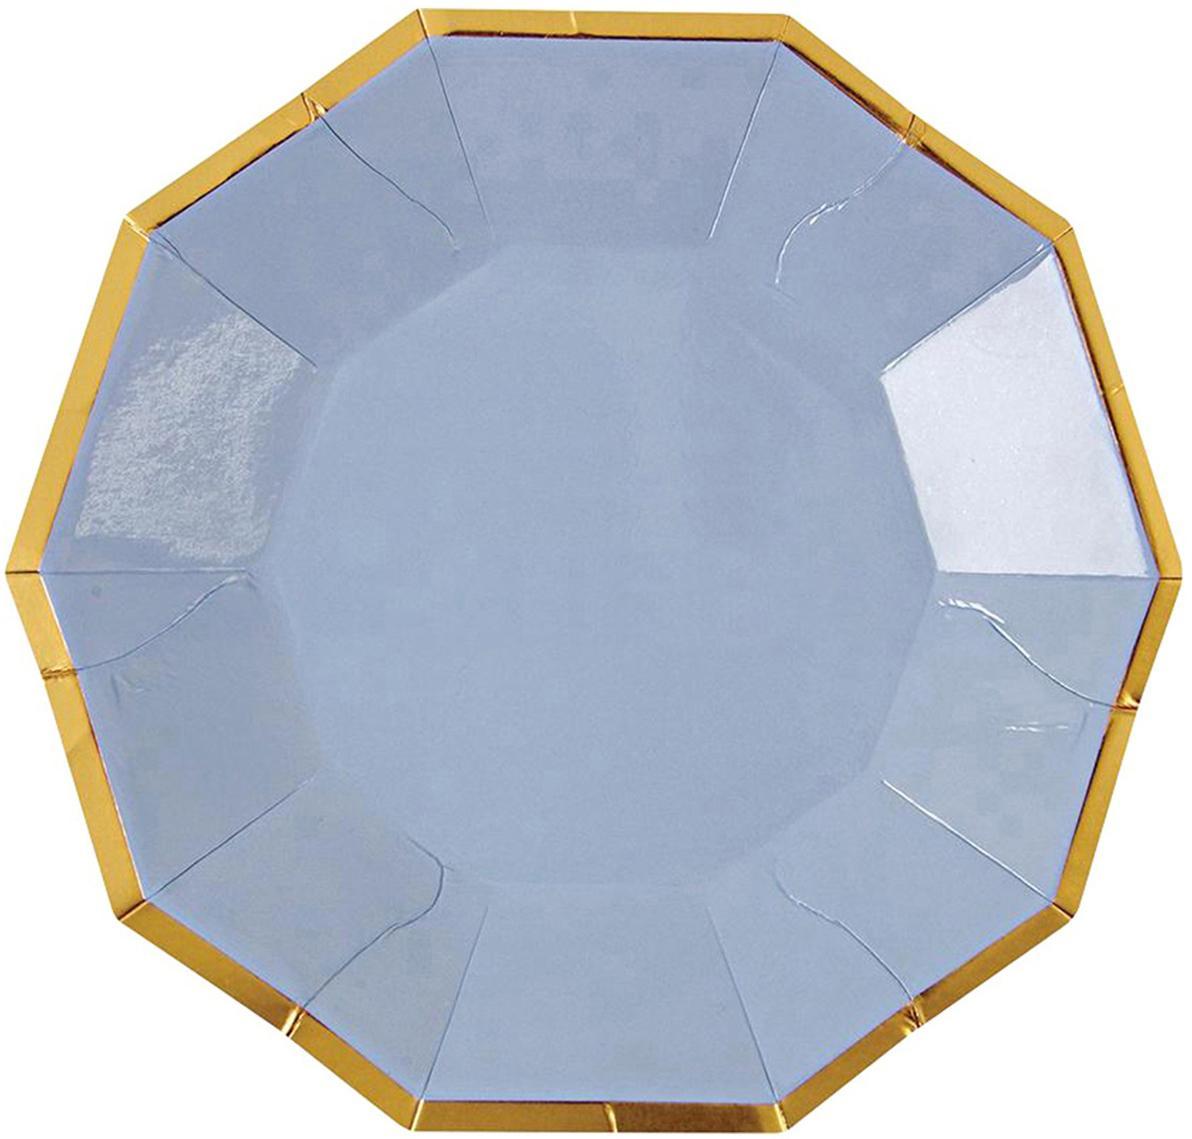 Papp-Teller Bloom, 16 Stück, Papier, beschichtet, Hellblau, Goldfarben, 11 x 11 cm